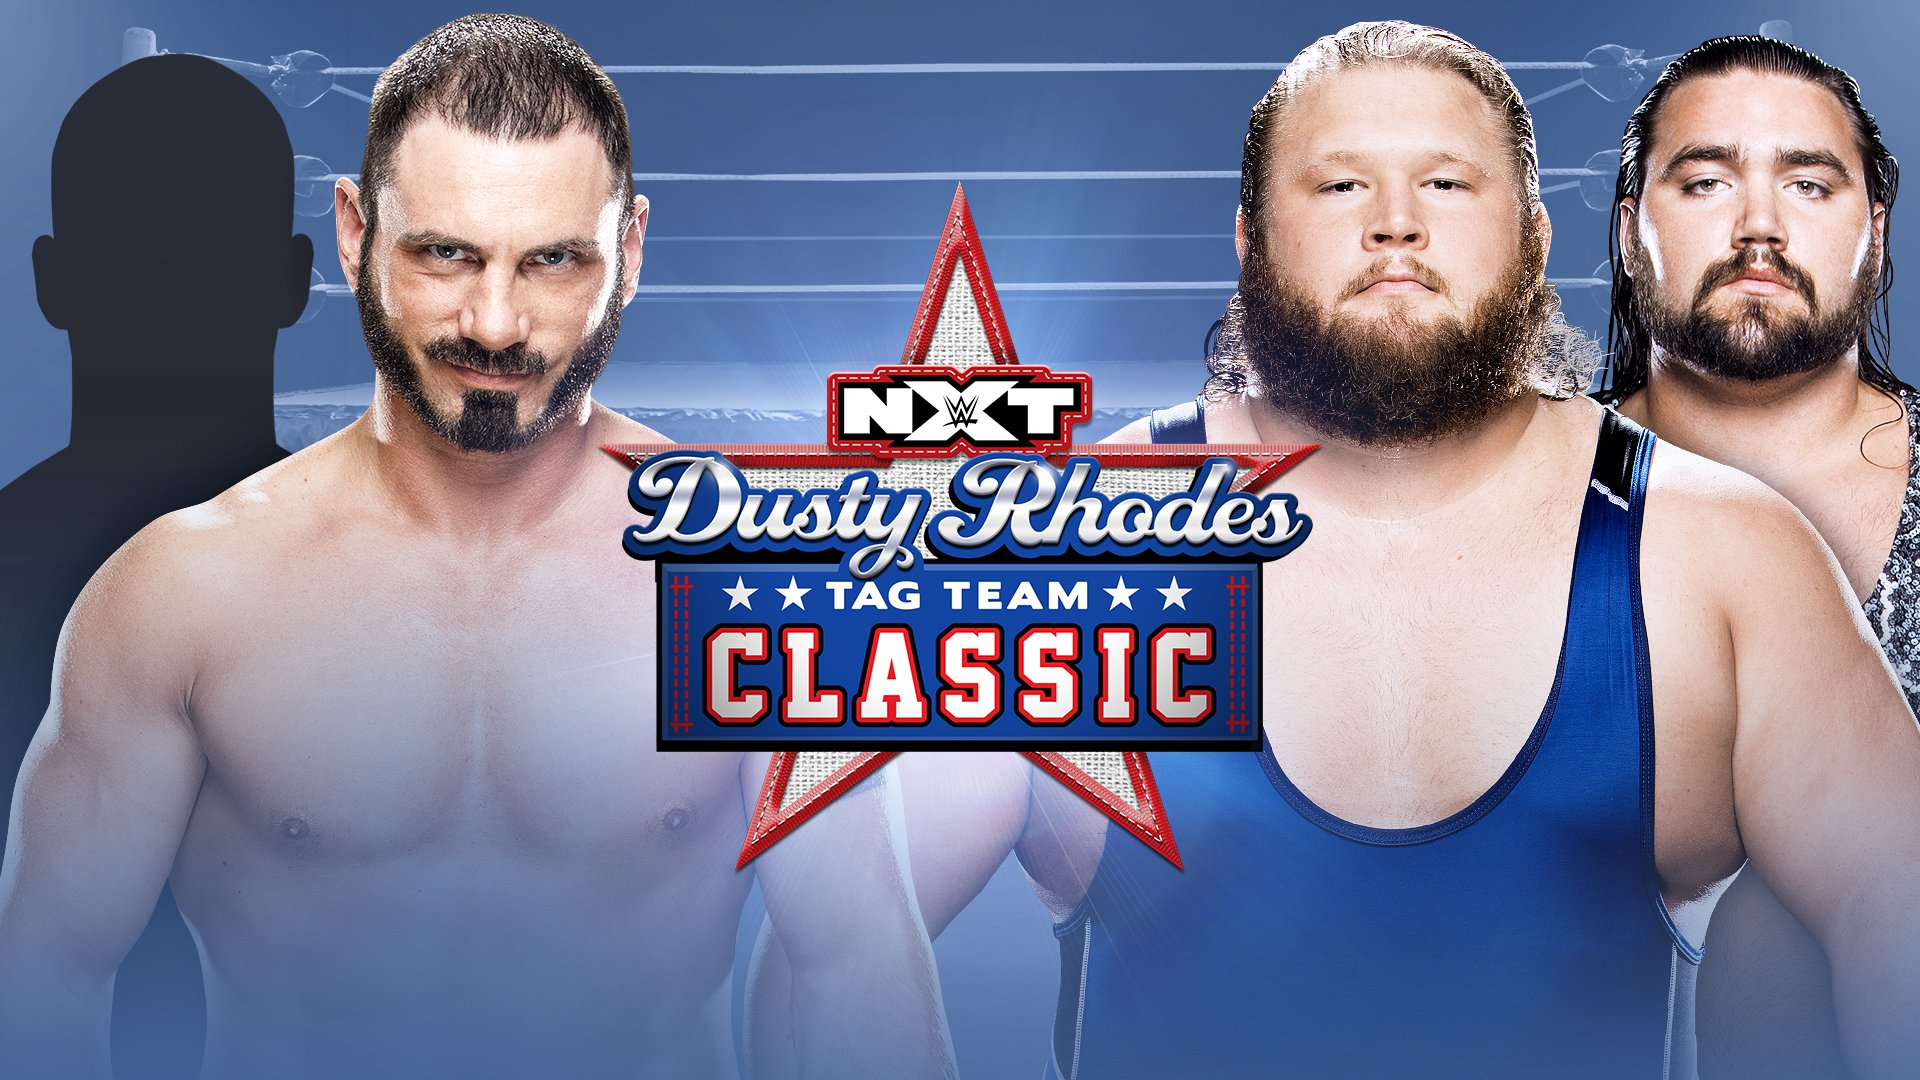 20161017_NXT_DustyTTC_match_tagteam_Arie